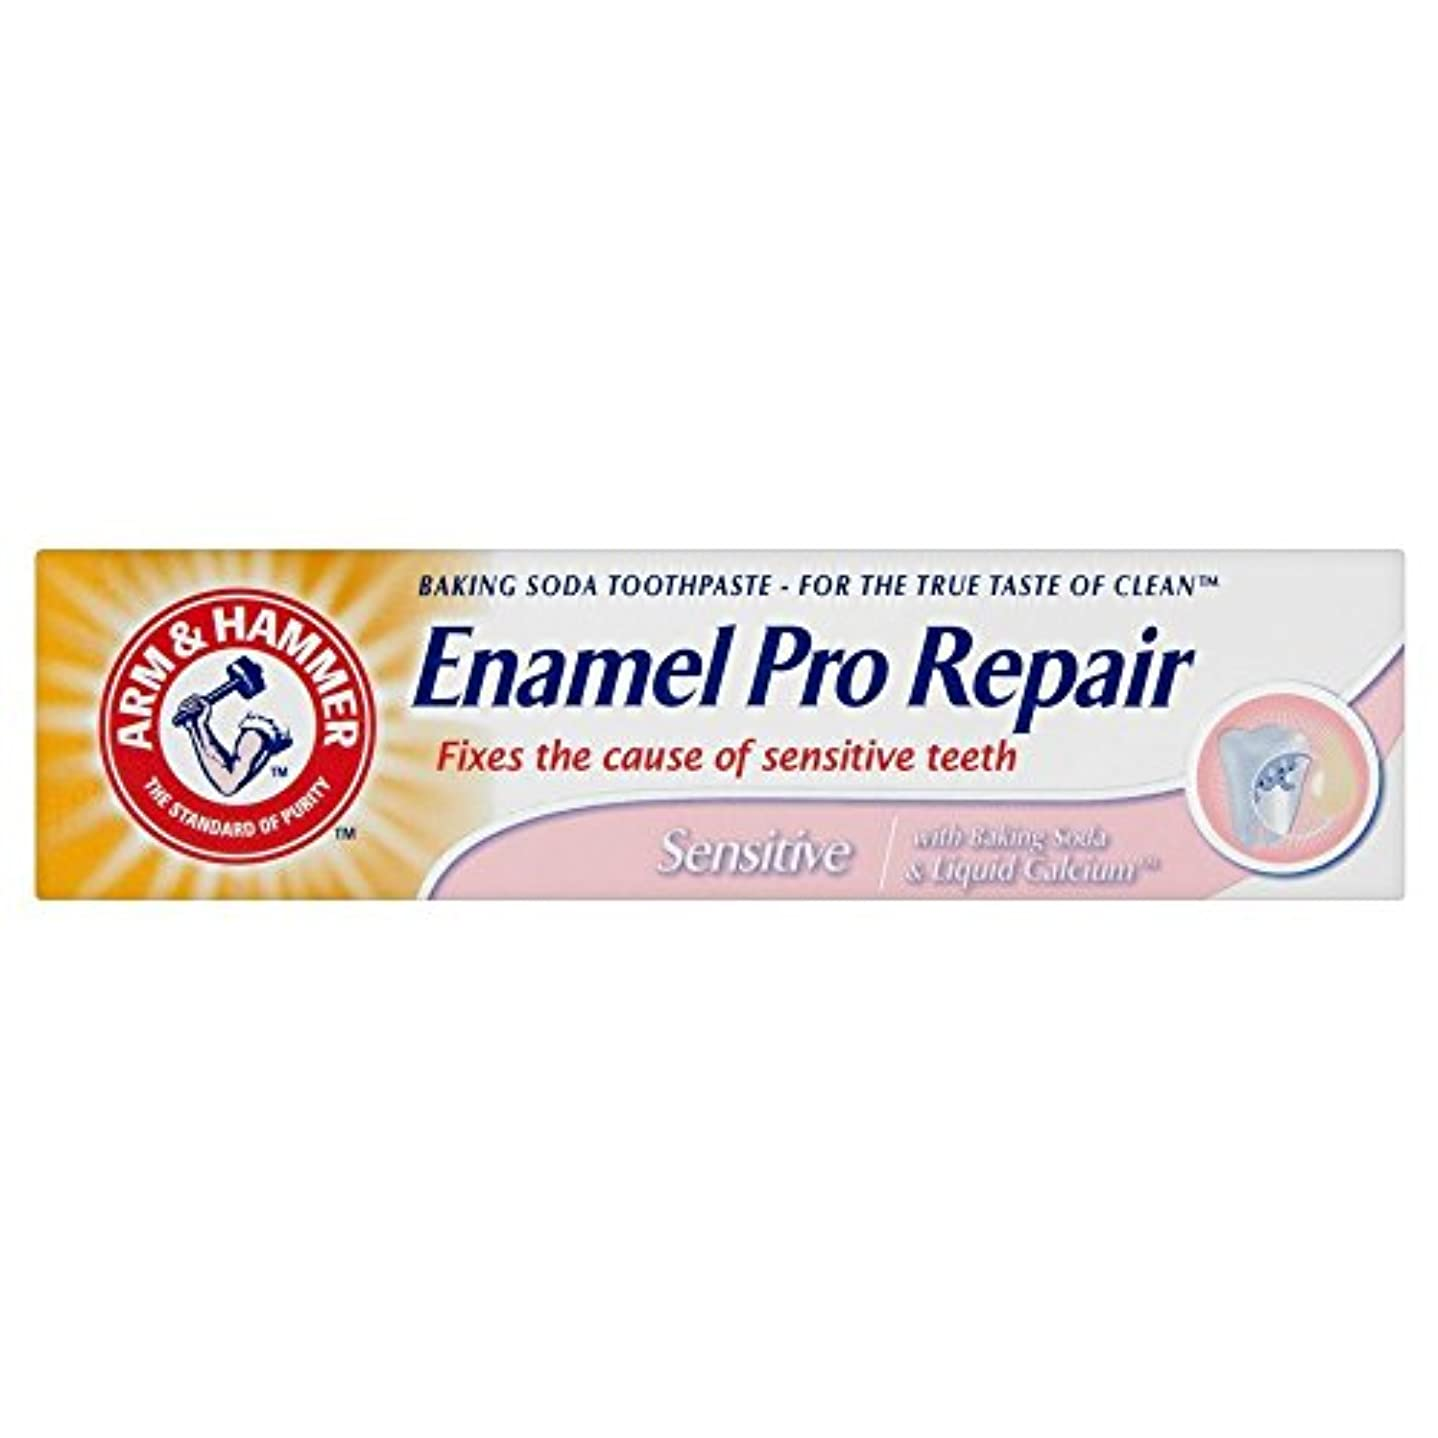 Arm & Hammer Enamel Care Sensitive Toothpaste Tube (75ml) アームとハンマーエナメルケア敏感歯磨き粉のチューブ( 75ミリリットル) [並行輸入品]